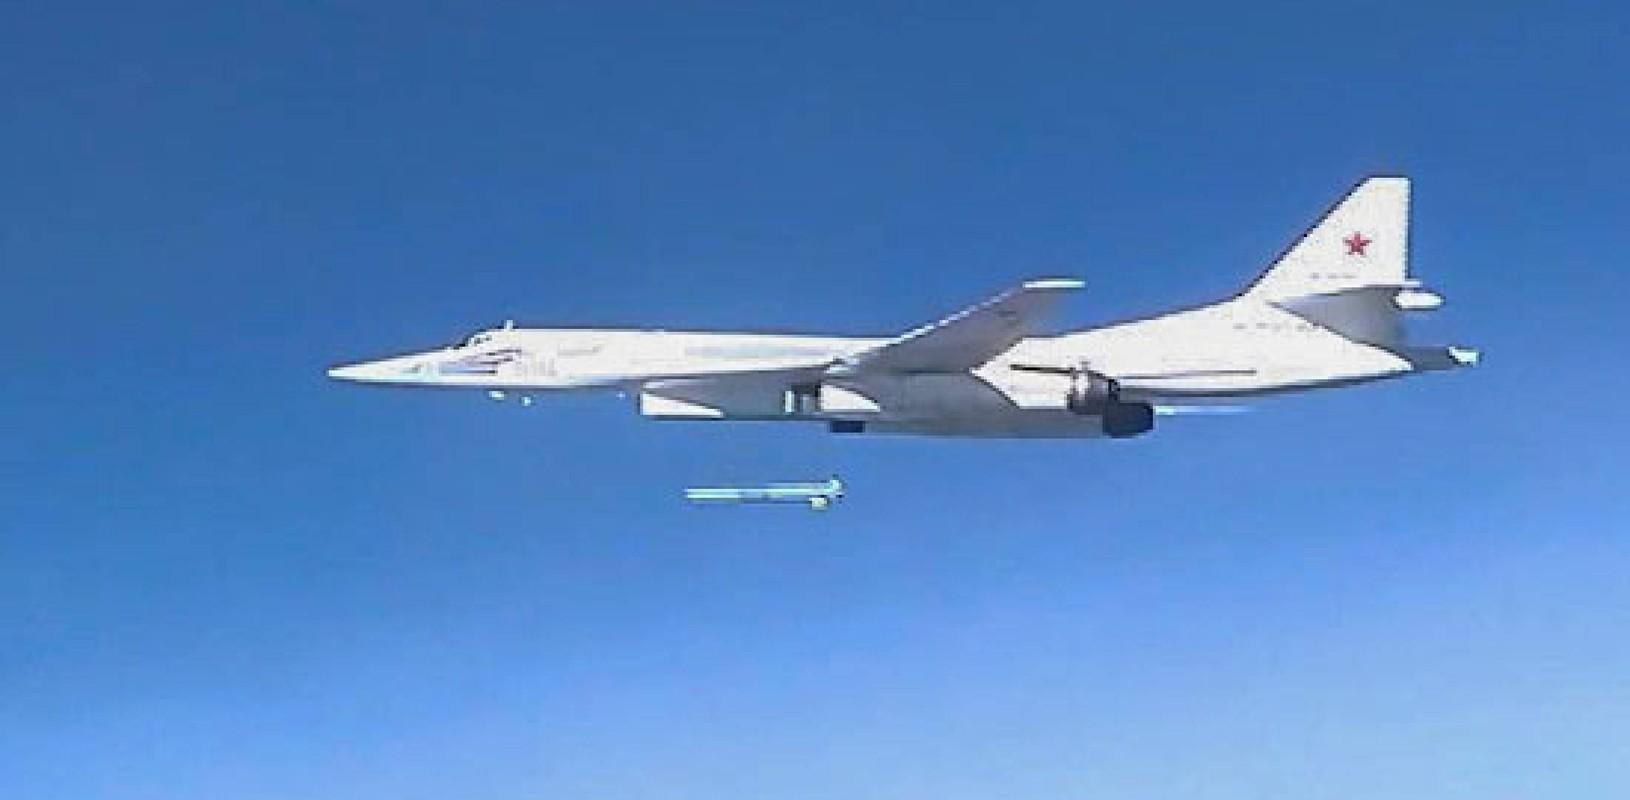 Trung Quoc om han khi thuong vu mua Tu-160 Ukraine bi My dap do-Hinh-5